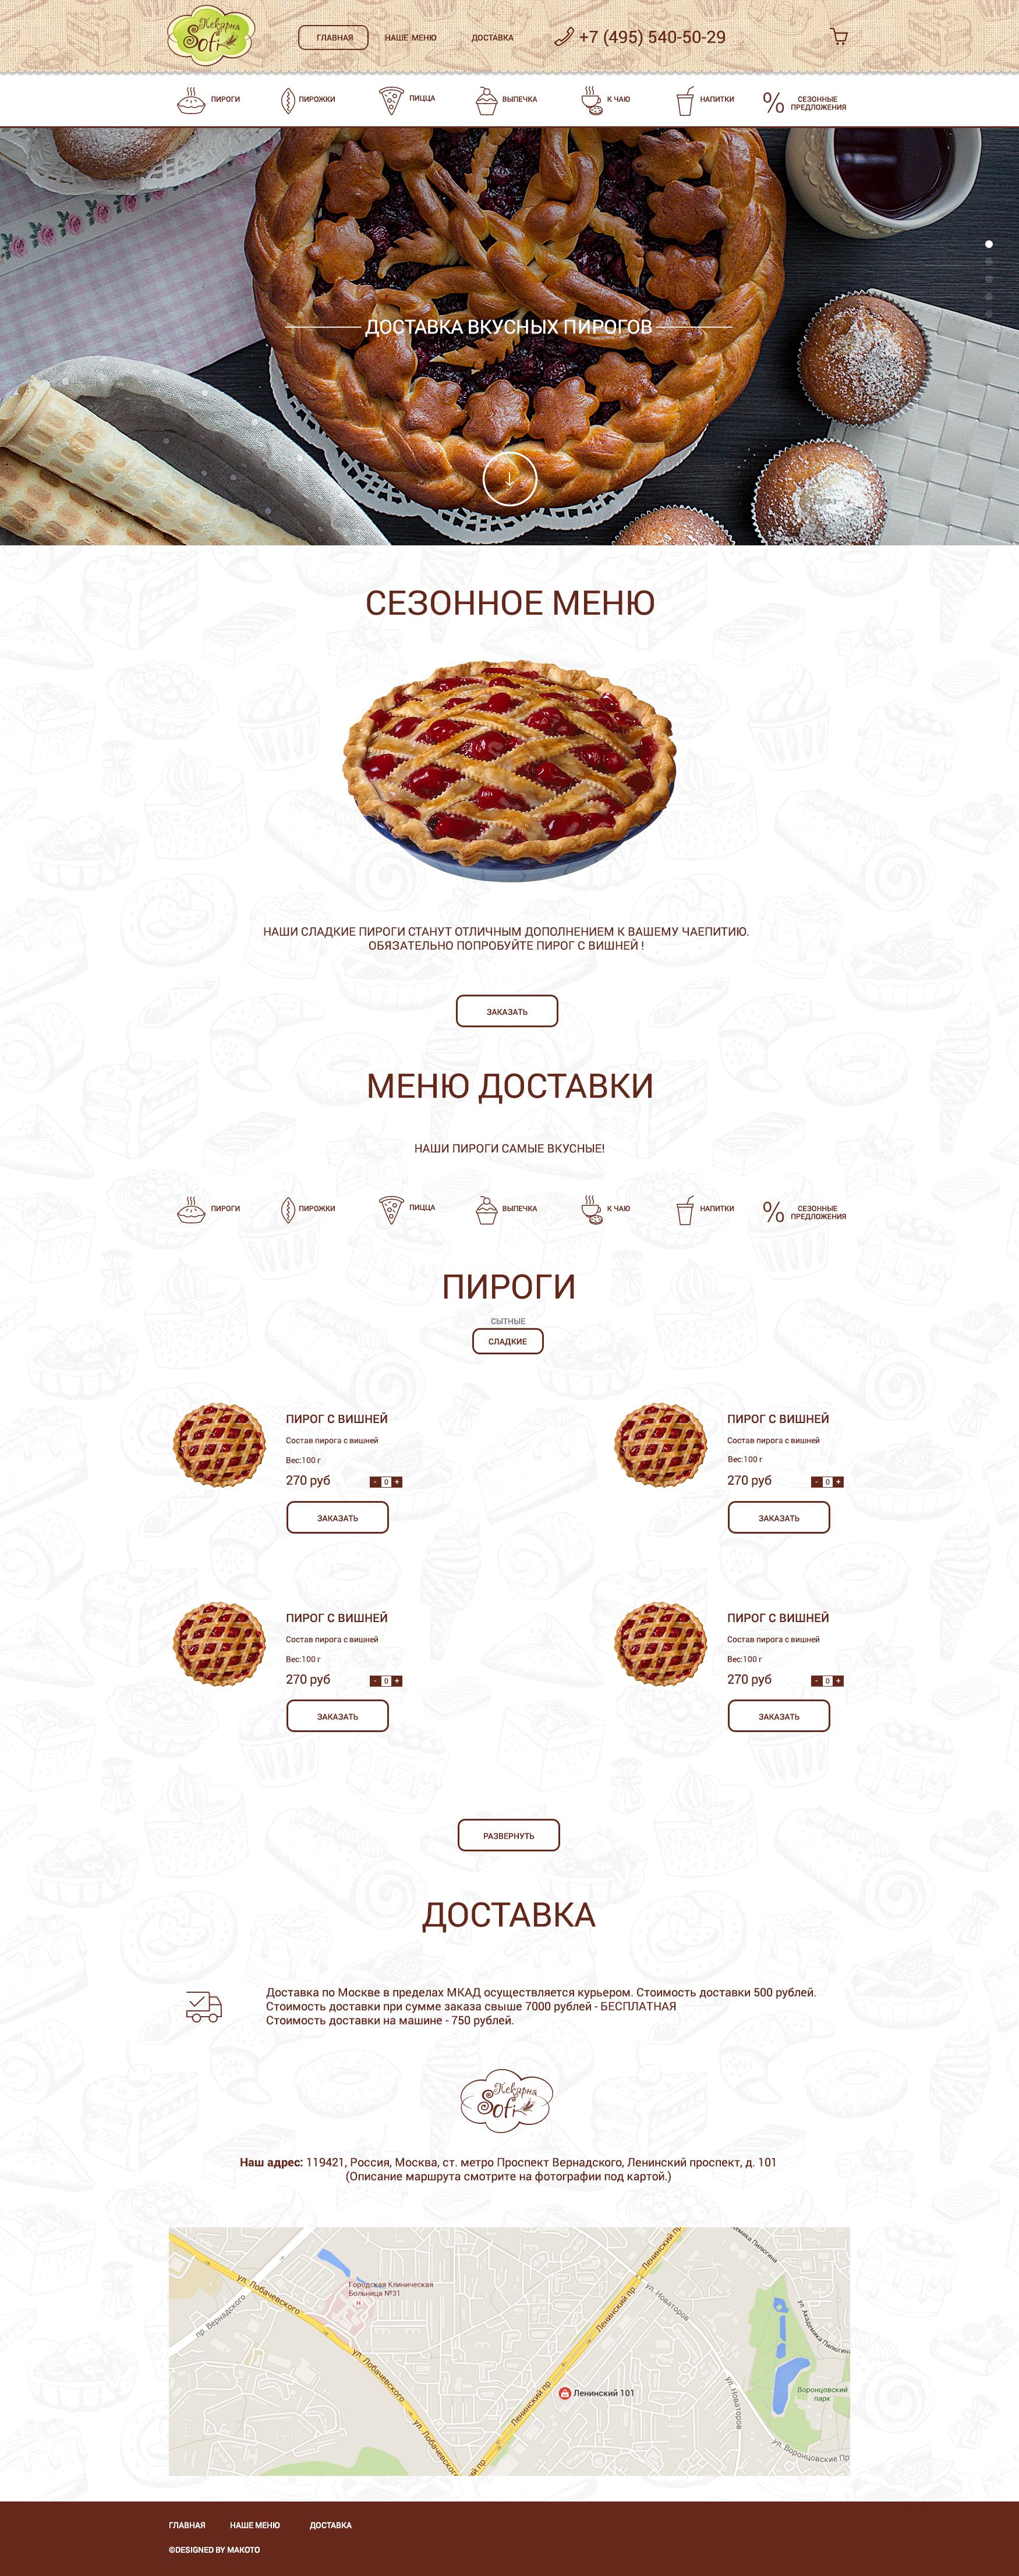 Сайт доставки пирогов